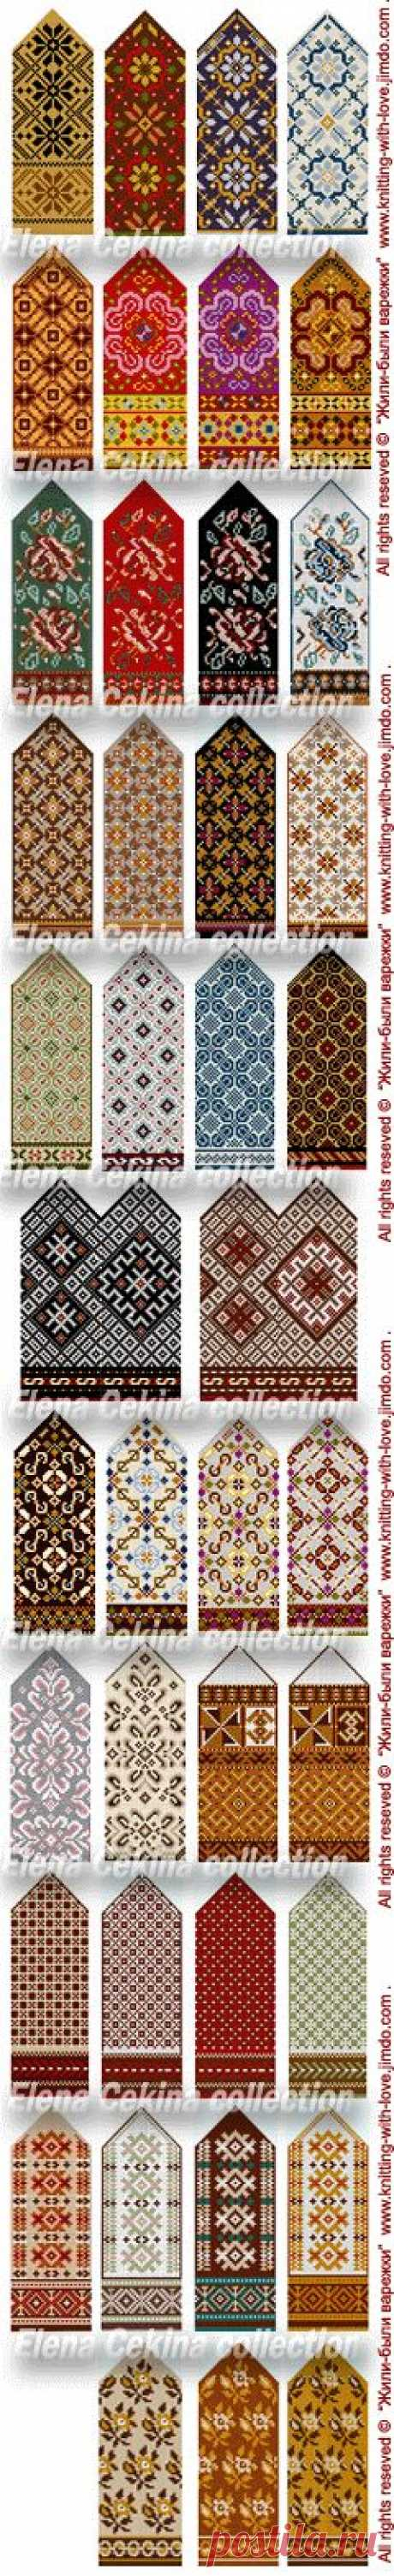 Главная - Вязание, варежки, схемы, узоры, мастер-классы, символы в орнаменте - Knitting, mittens, jacquard patterns, master-class, symbols in ornament,